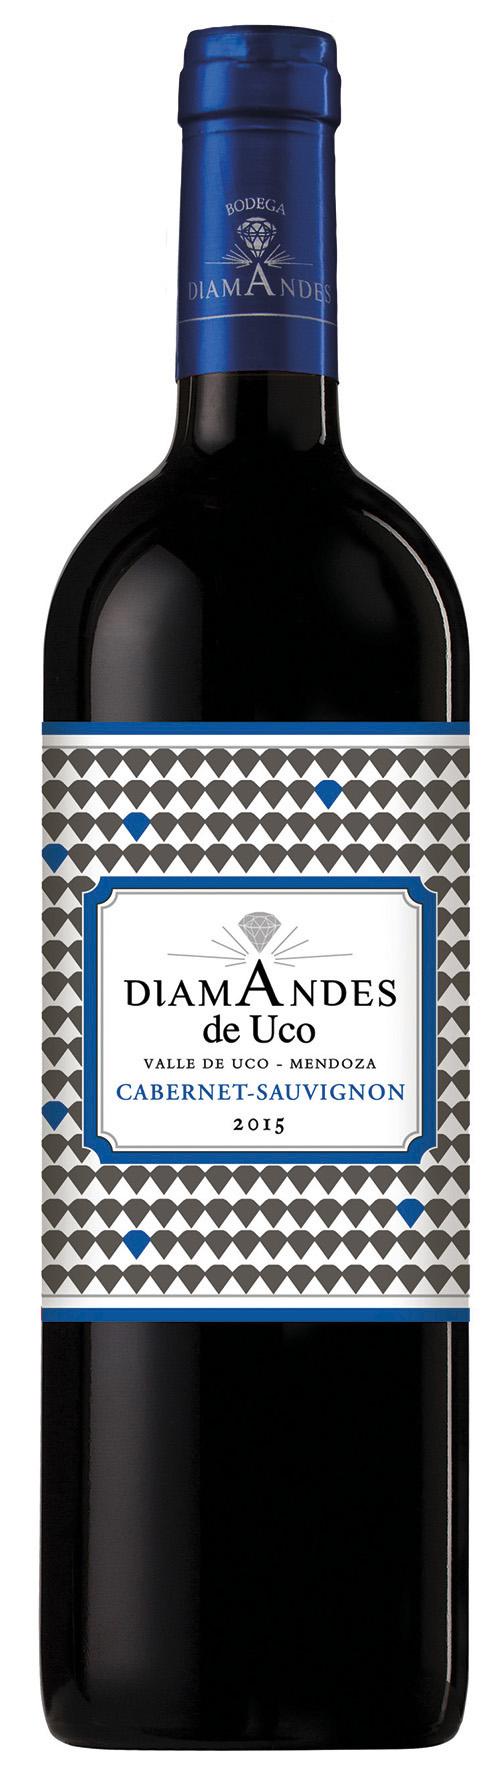 DiamAndes de Uco Cabernet Sauvignon 2015